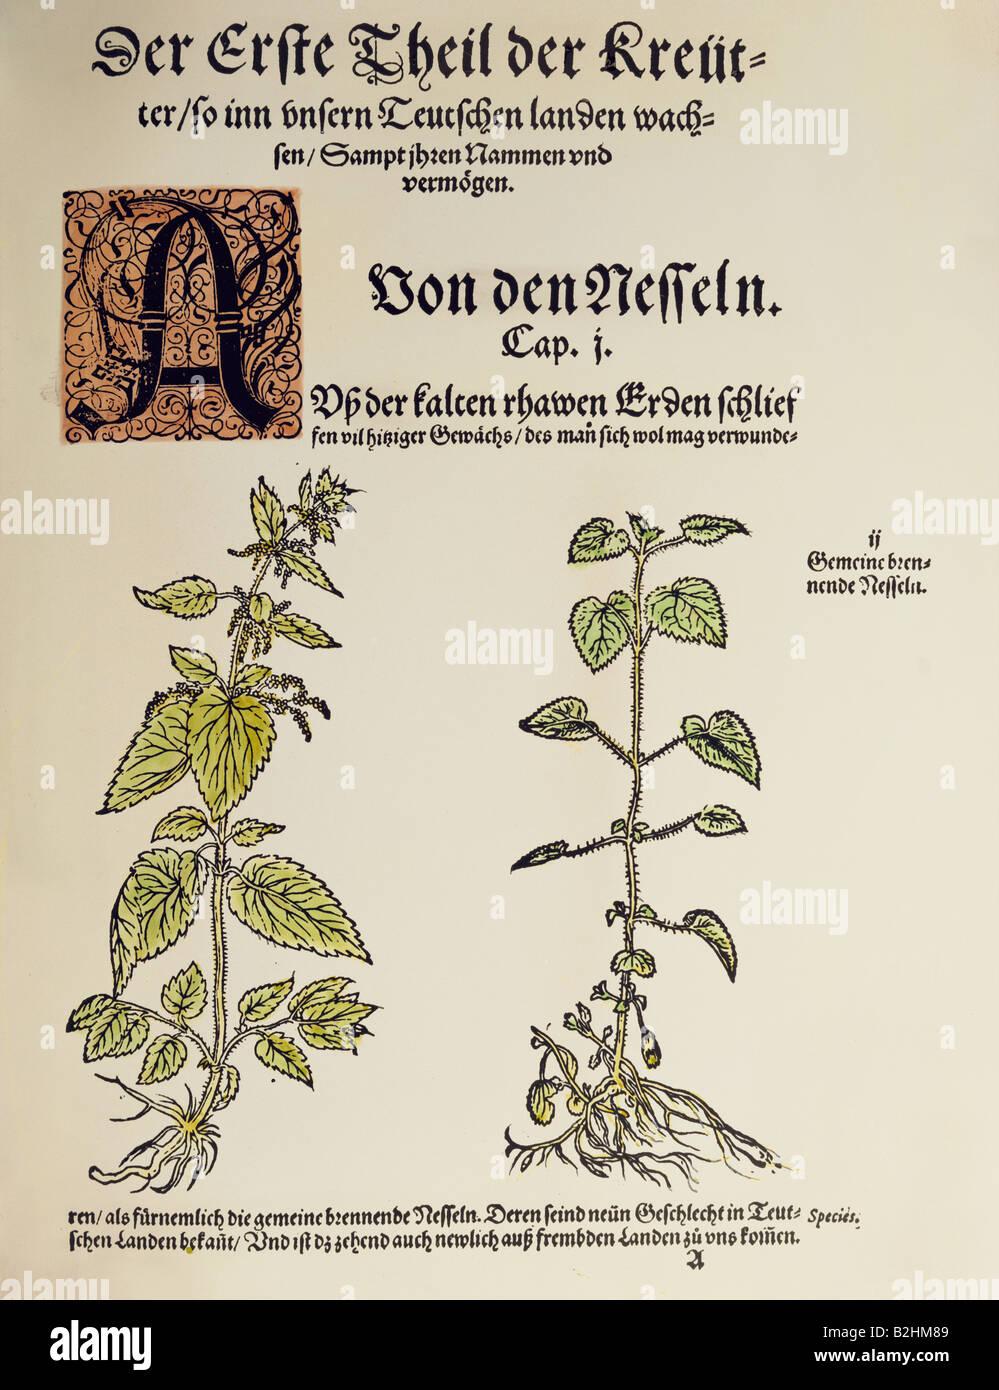 [Image: botany-herbs-stinging-nettle-urtica-dioi...B2HM89.jpg]